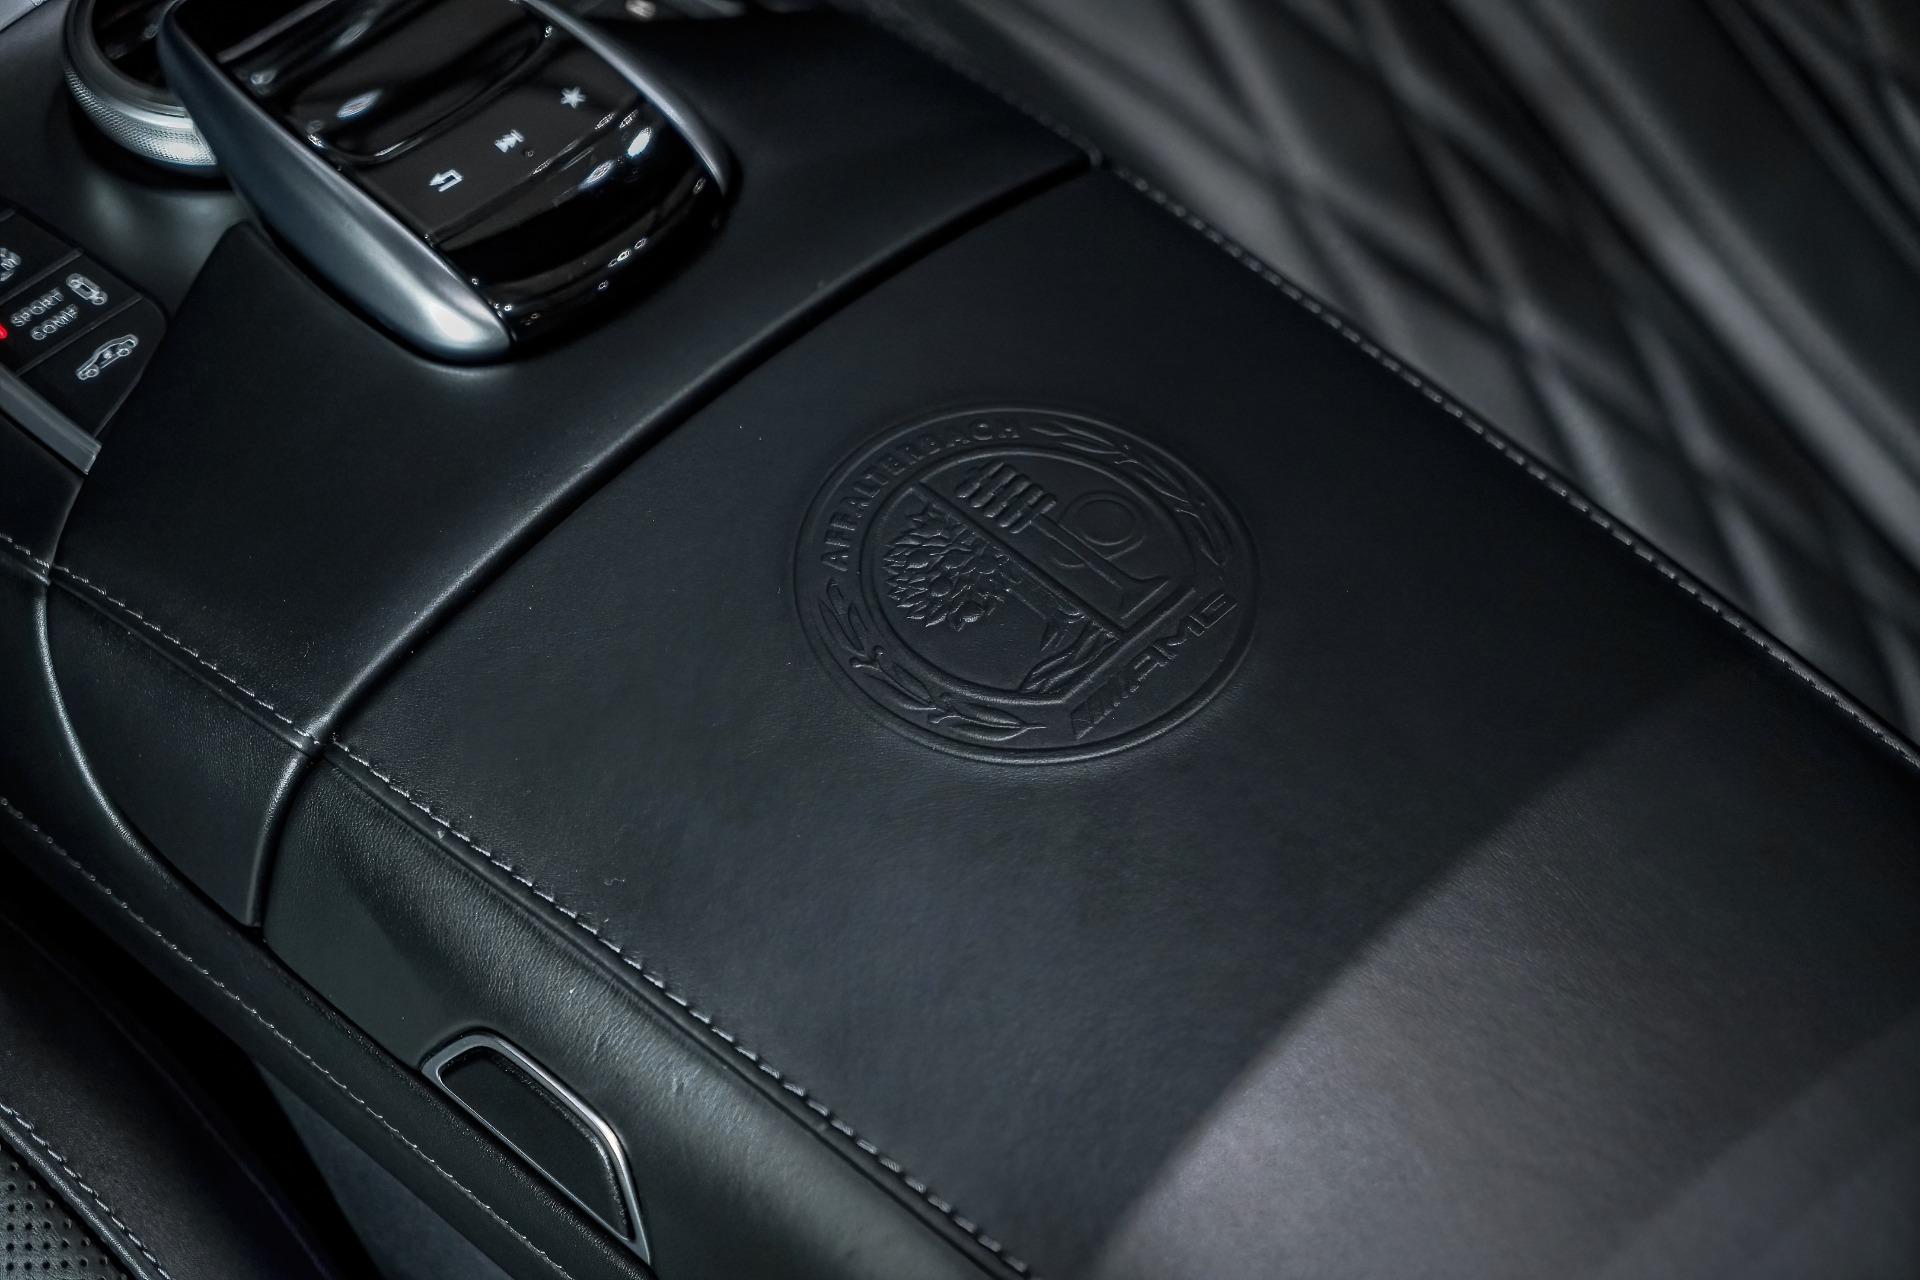 Used-2017-Mercedes-Benz-S63-AMG-Convertible-4MATIC-AMG-CARBON-FIBER-PKG-DRIVERS-ASSISTANCE-PKG-LOADED